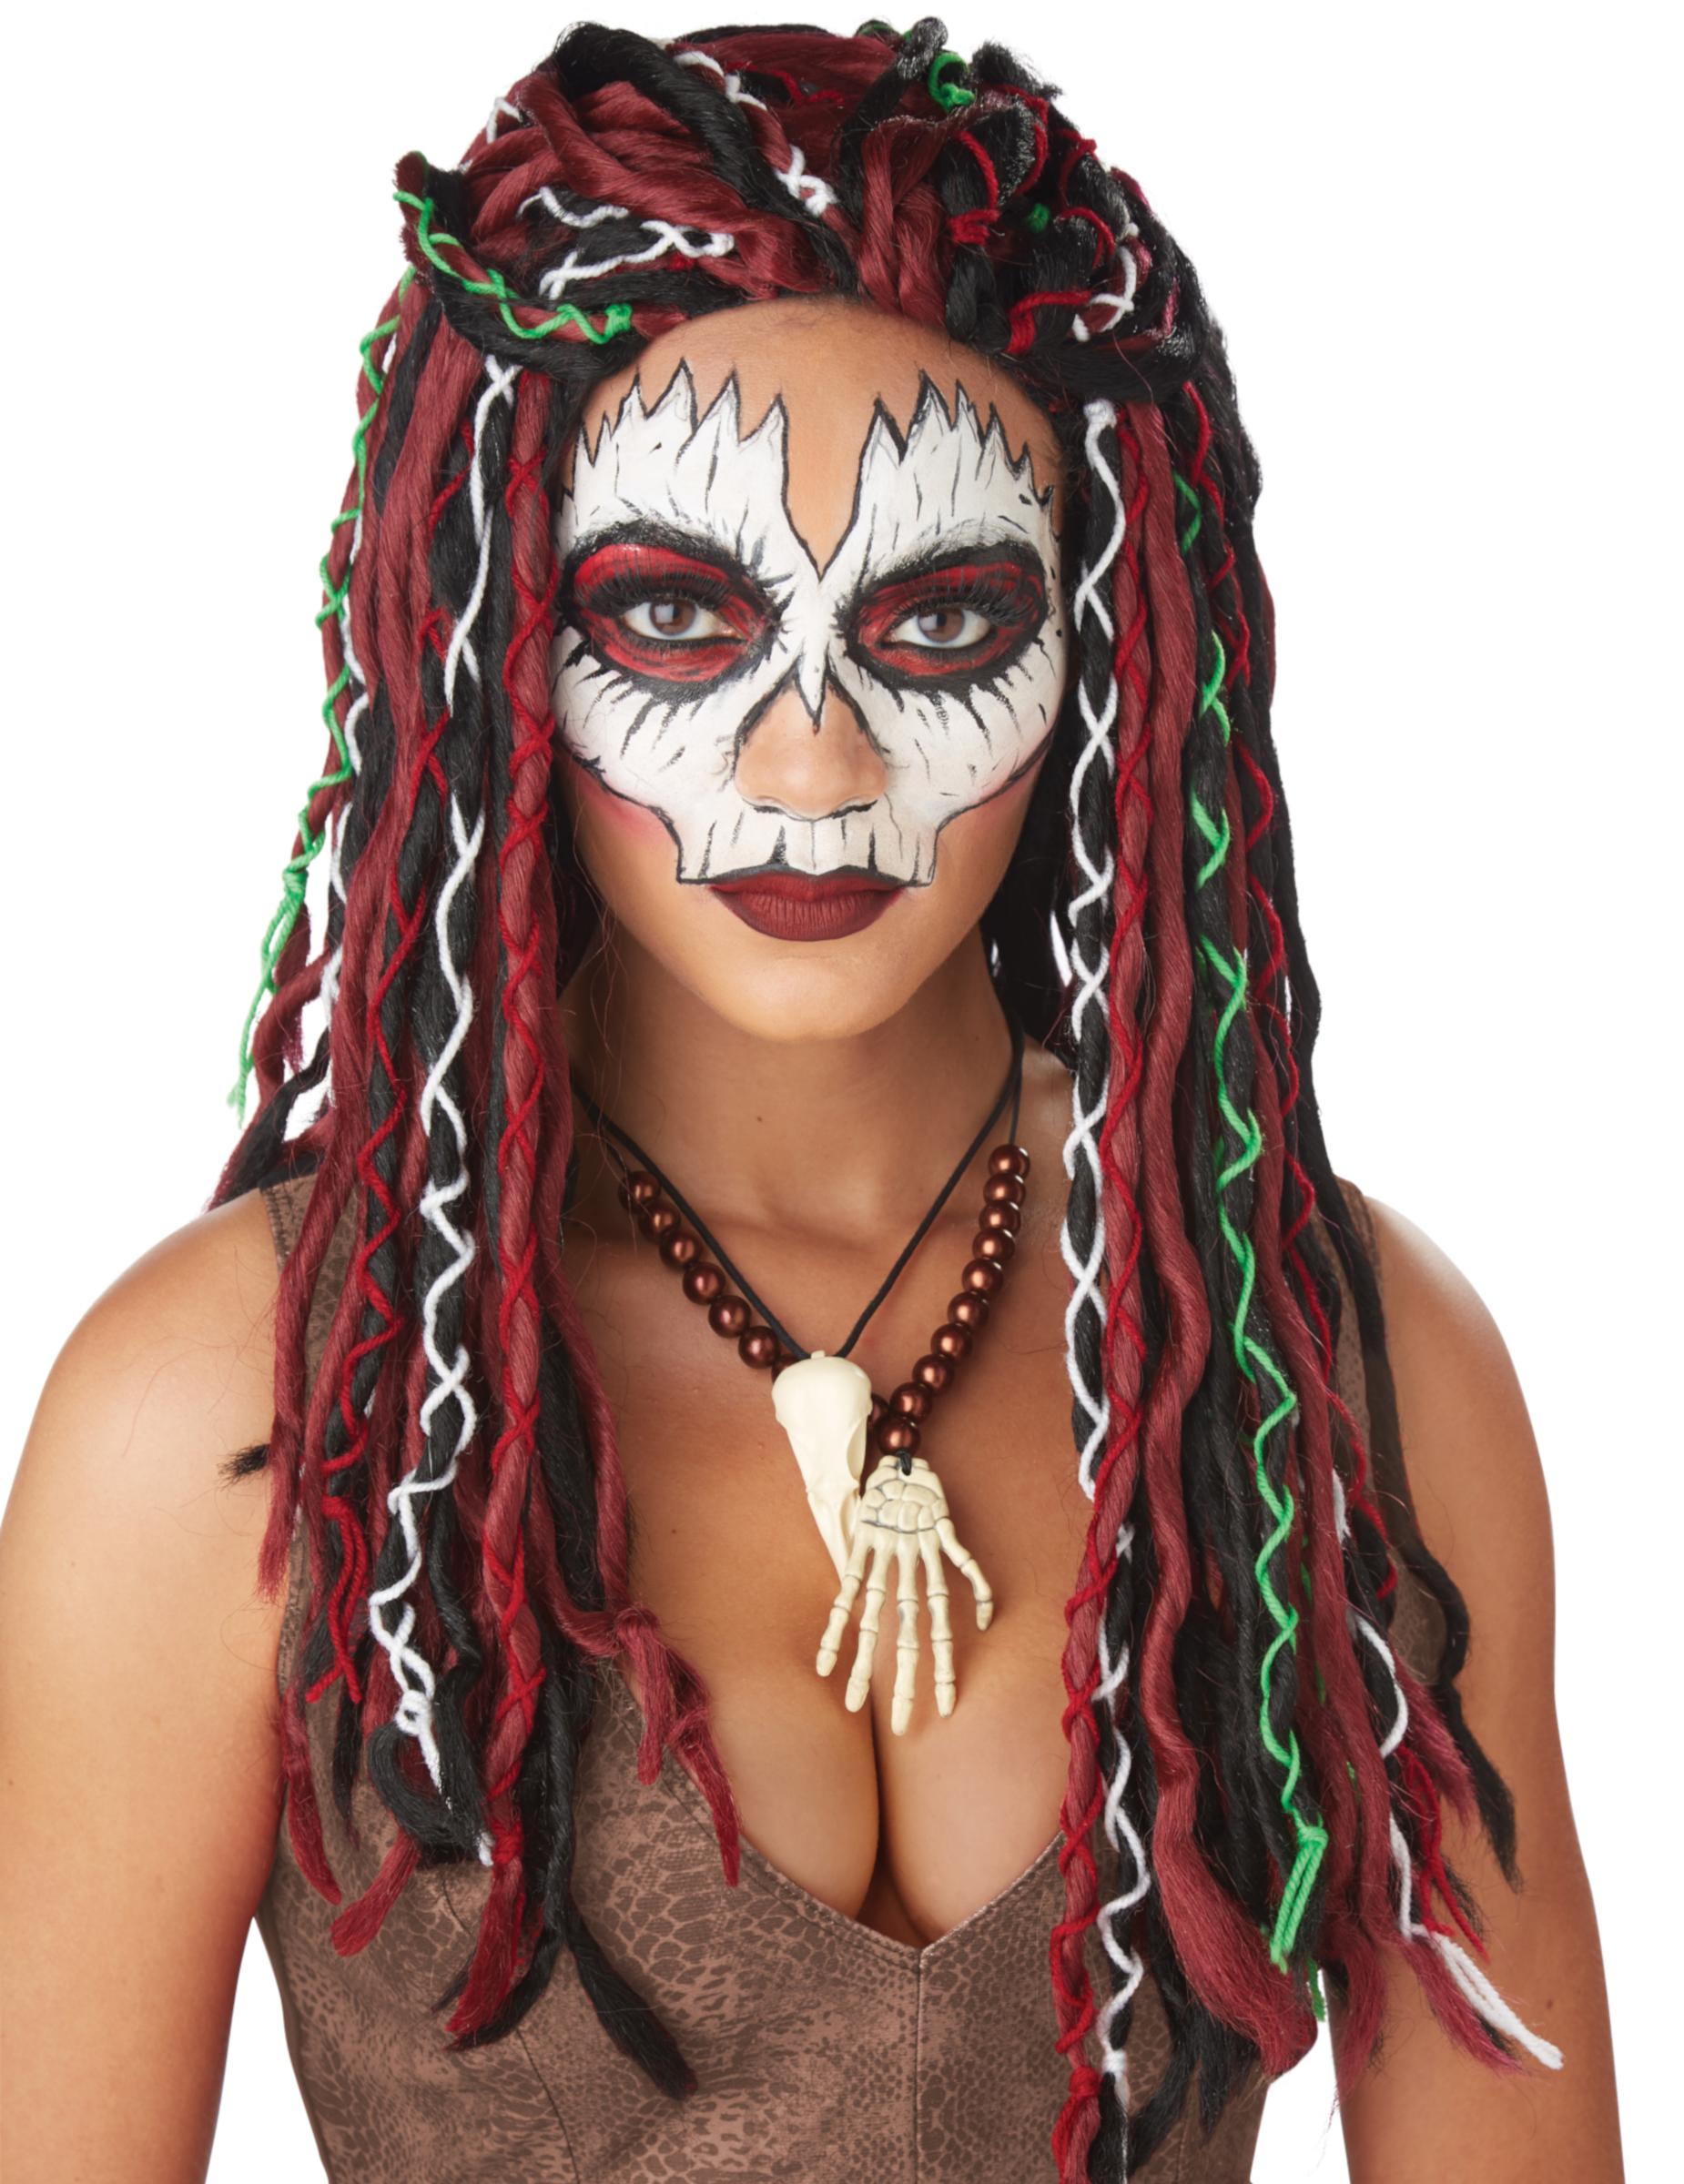 Dreadlocks Voodoo-Perücke Halloween-Accessoire für Damen bunt 292383